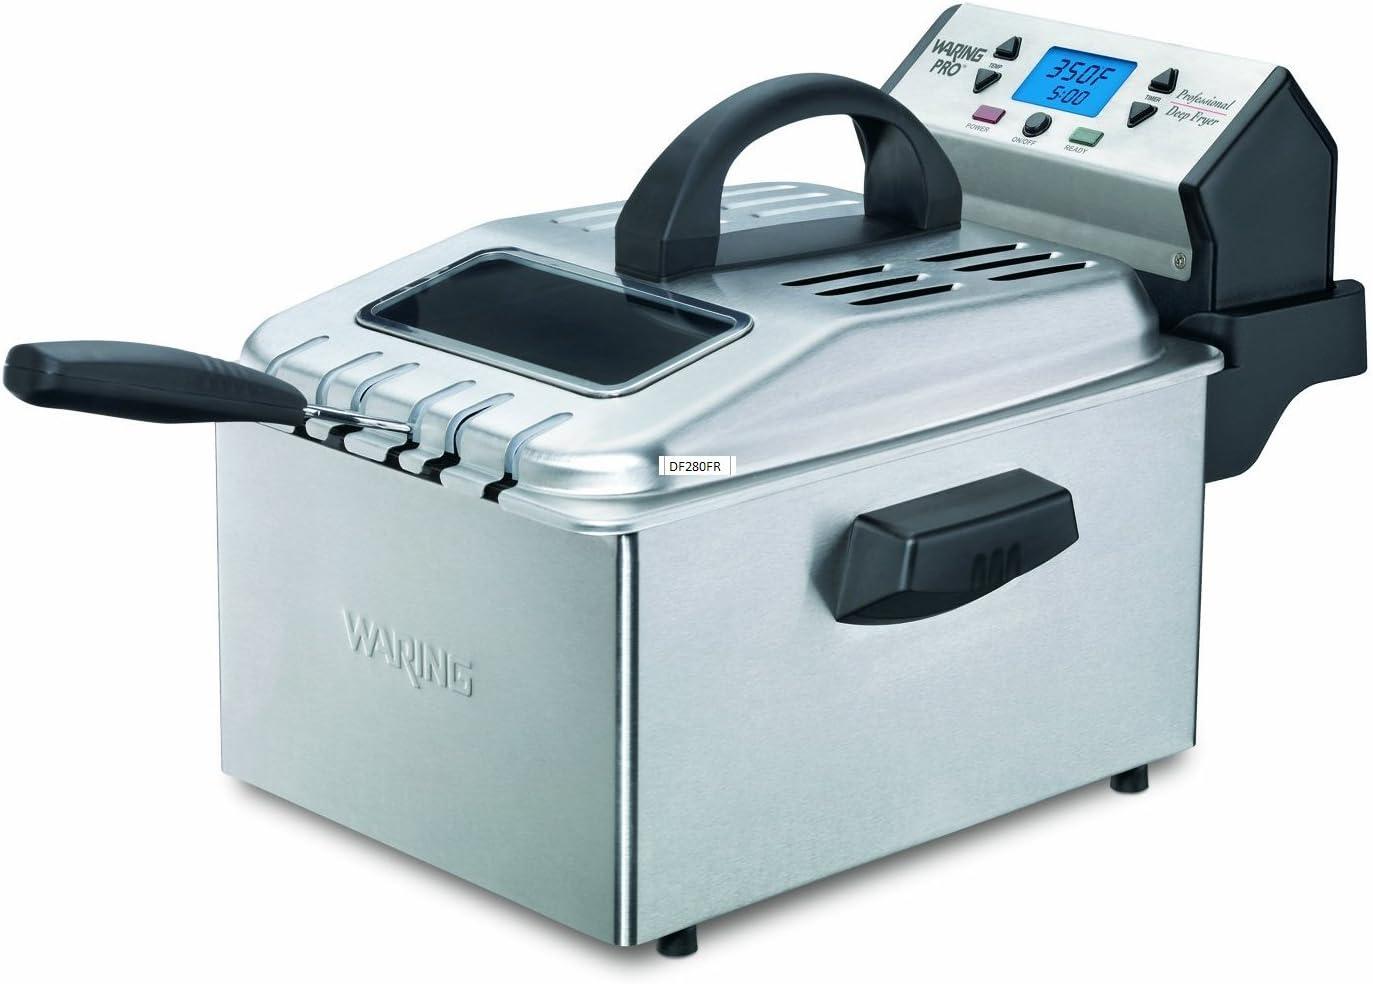 Waring Pro DF280 Professional Deep Fryer, Brushed Stainless Renewed